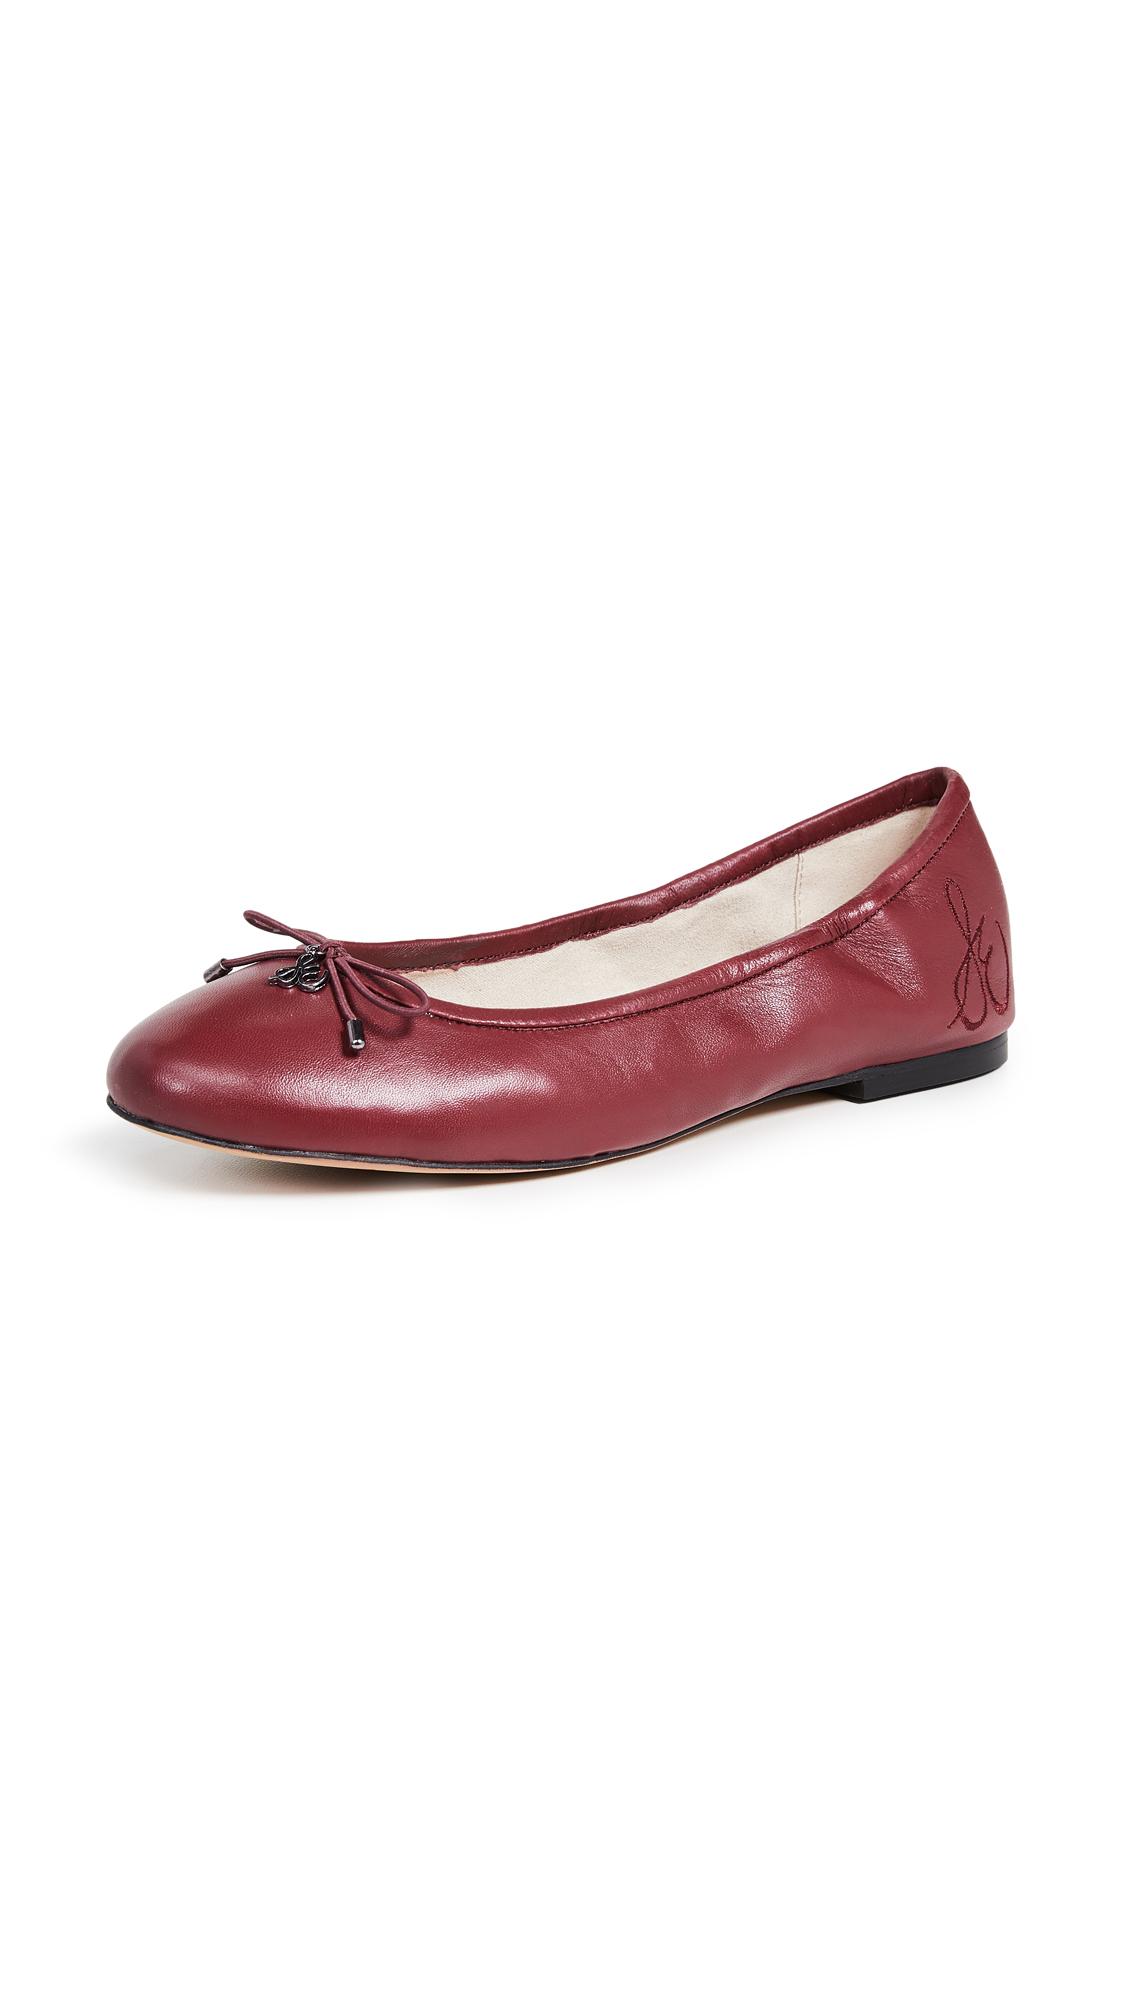 Sam Edelman Felicia Ballet Flats - Beet Red